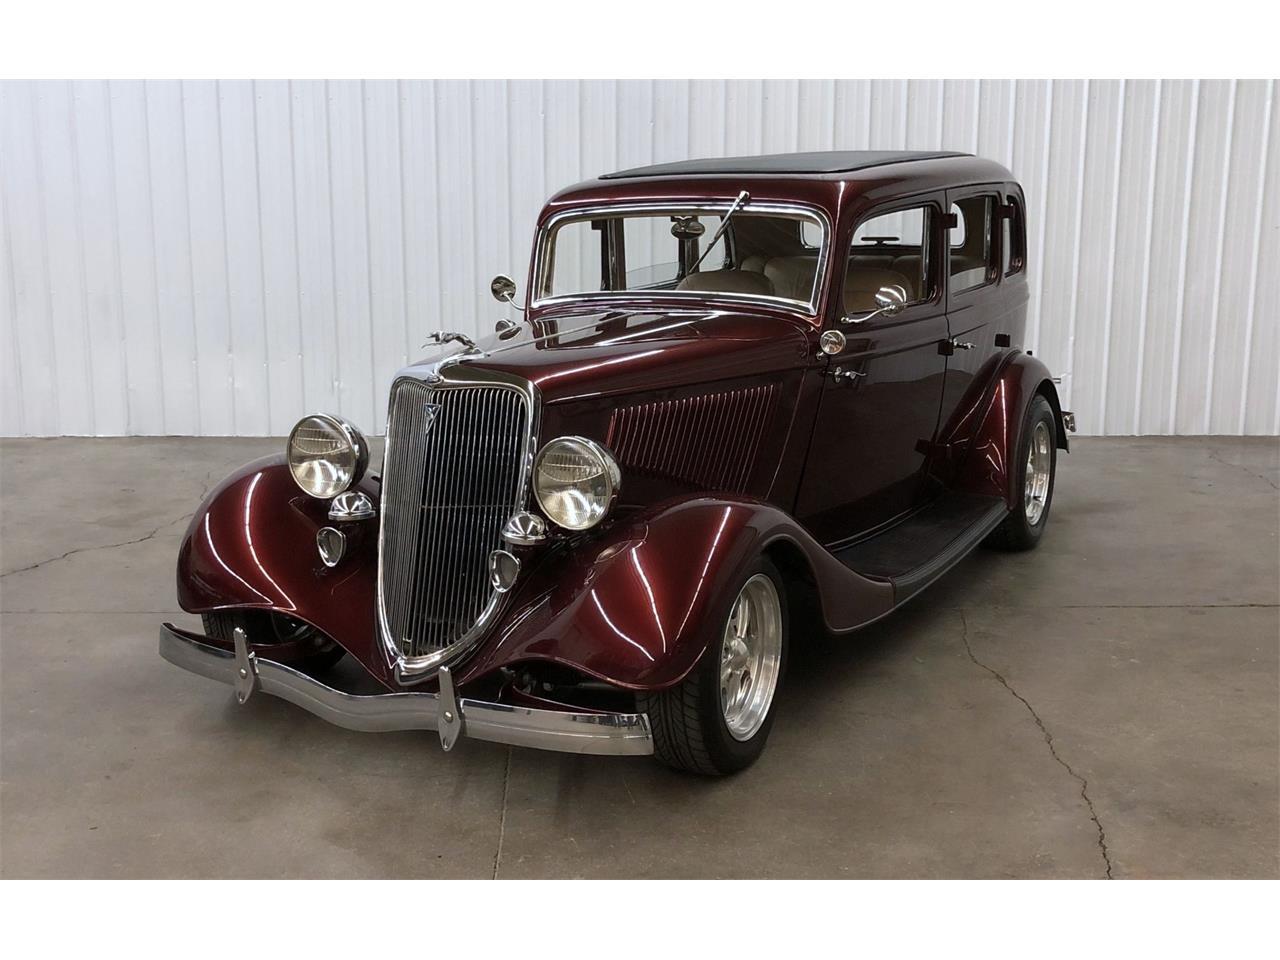 1934 Ford 4-Dr Sedan (CC-1422020) for sale in Maple Lake, Minnesota